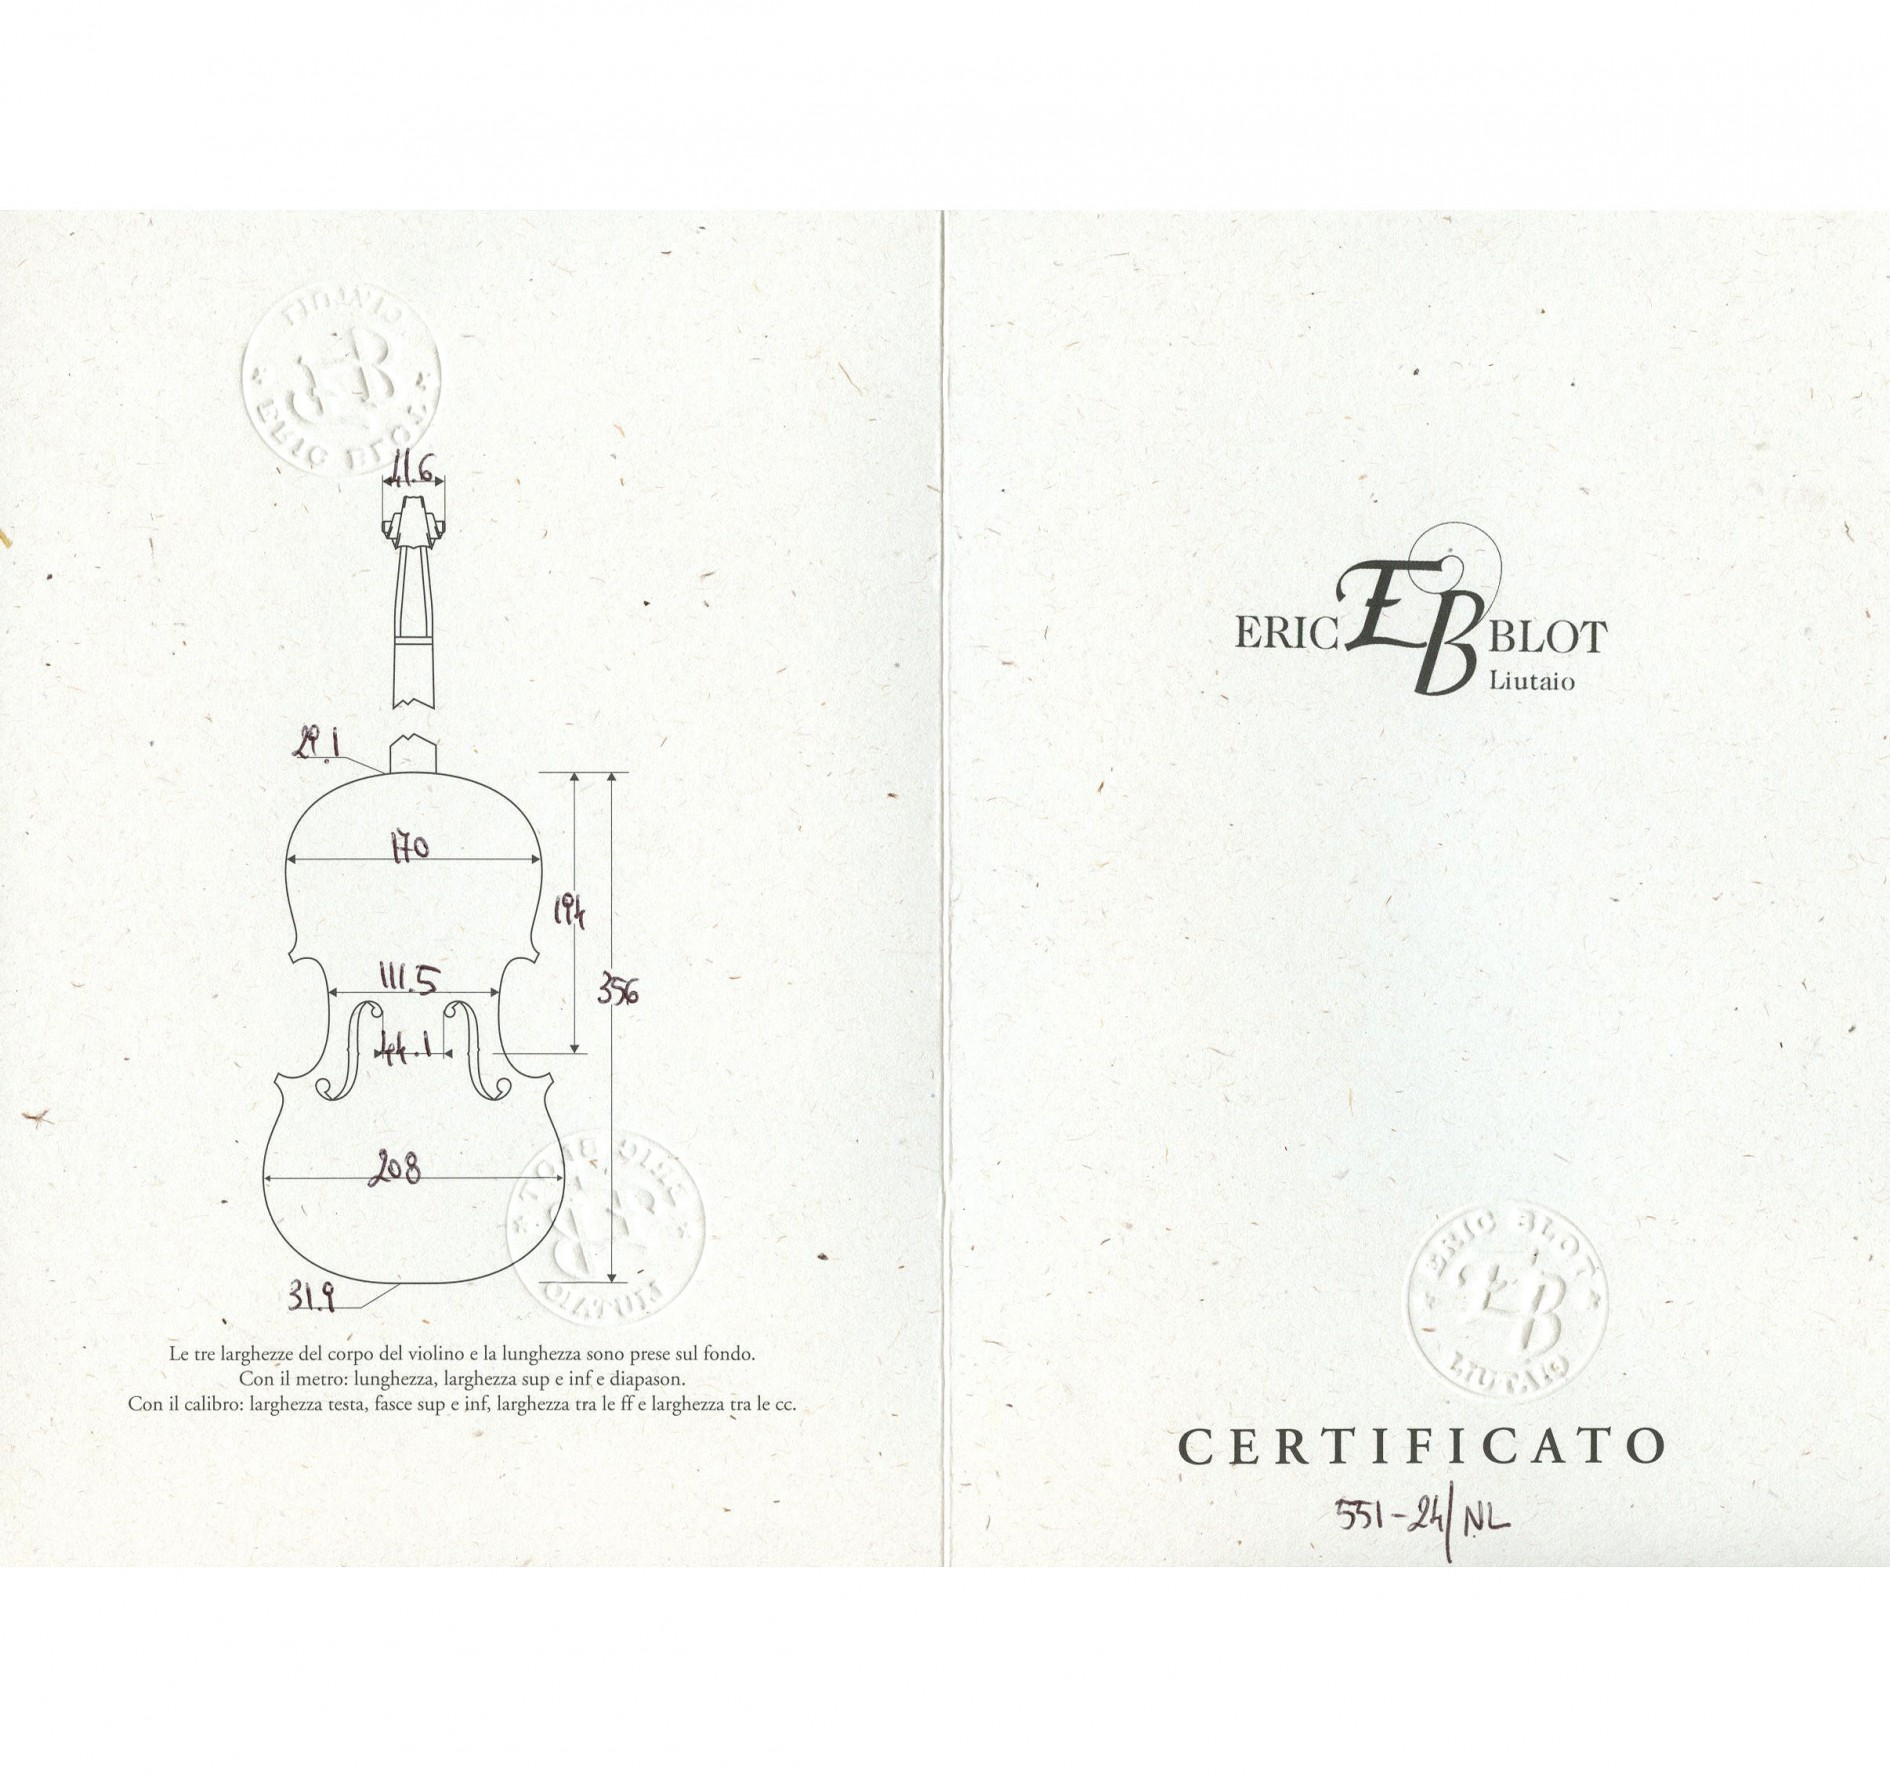 Eric Blot certificate